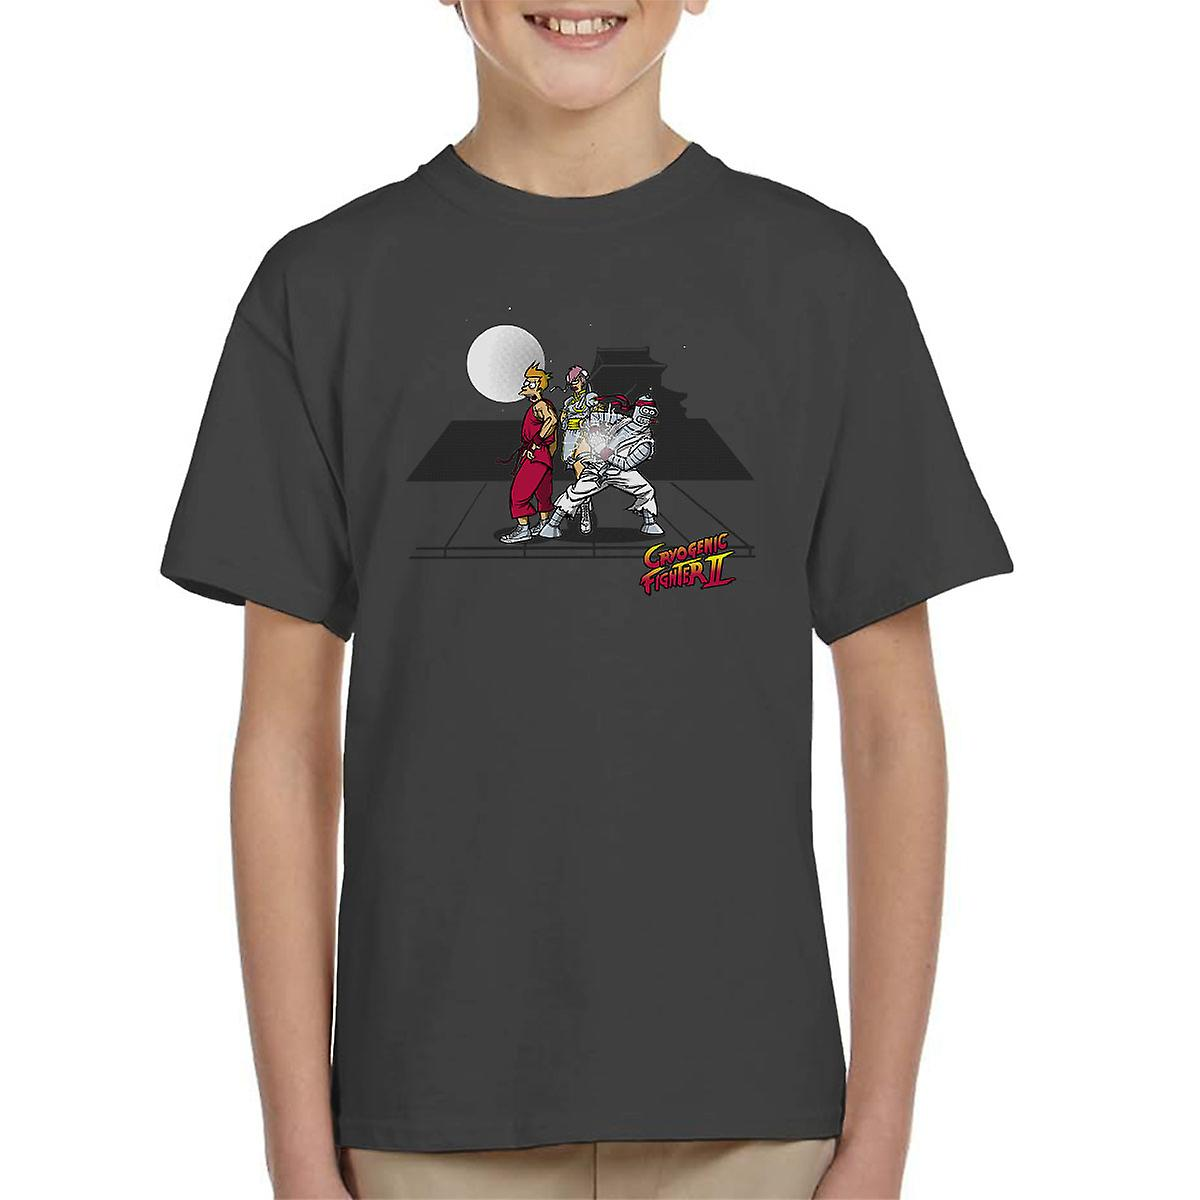 Cryogenic Fighter II Futurama Street Fighter Kid's T-Shirt